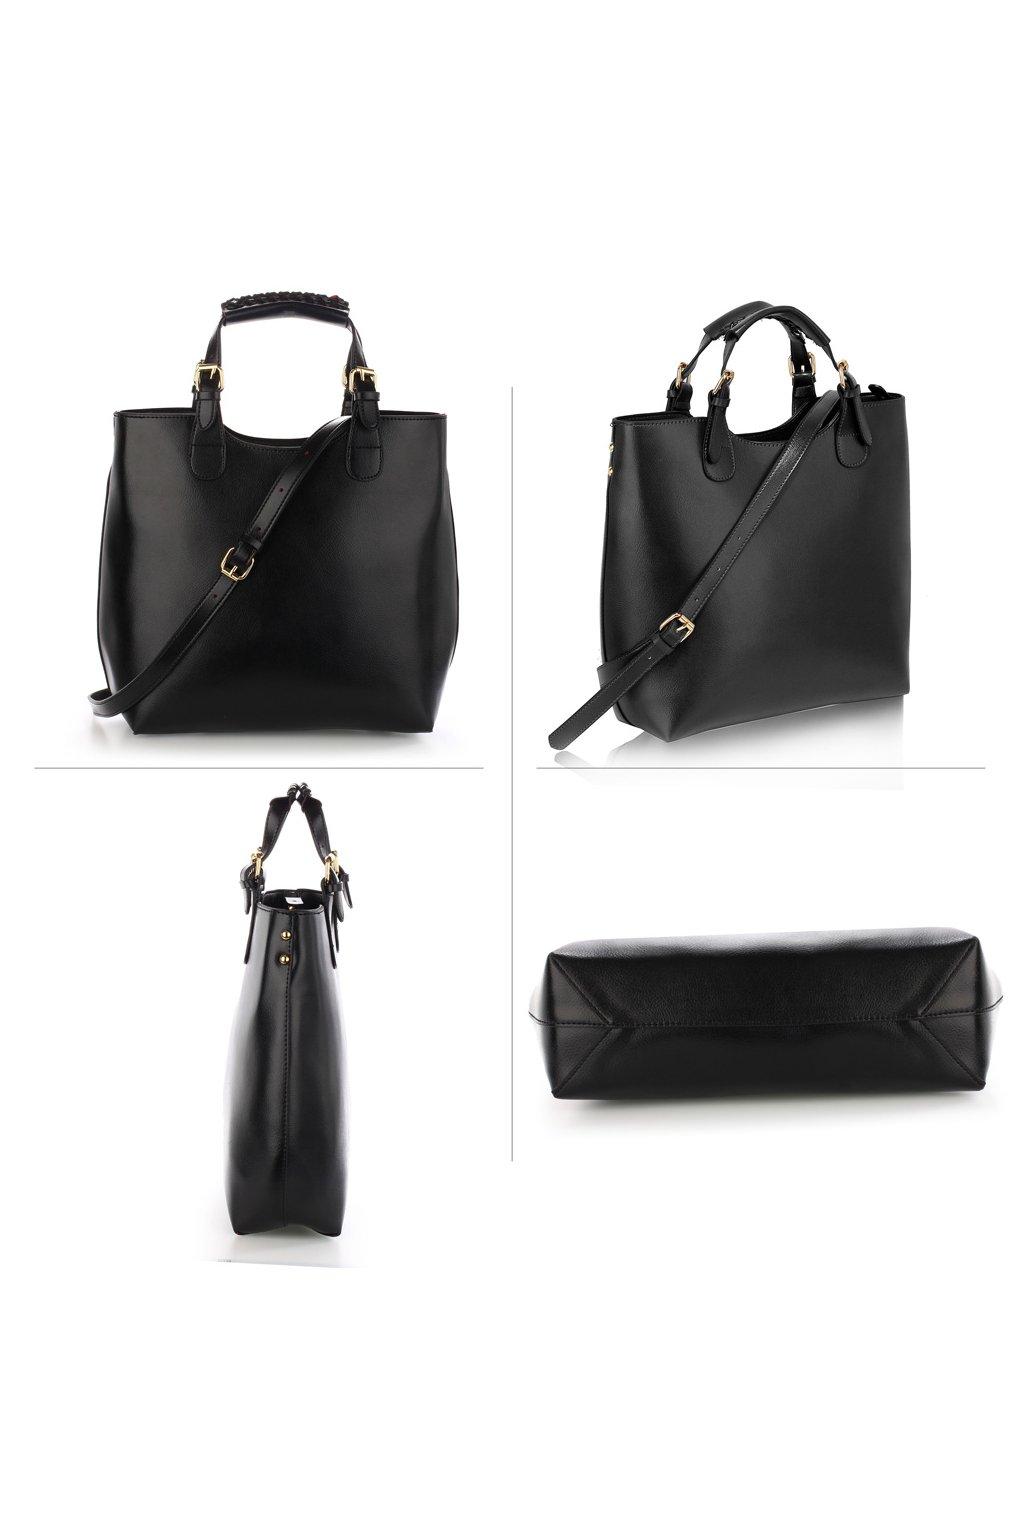 Kabelka čierna Delia AG00267 čierna kabelka ... 926f55ab750